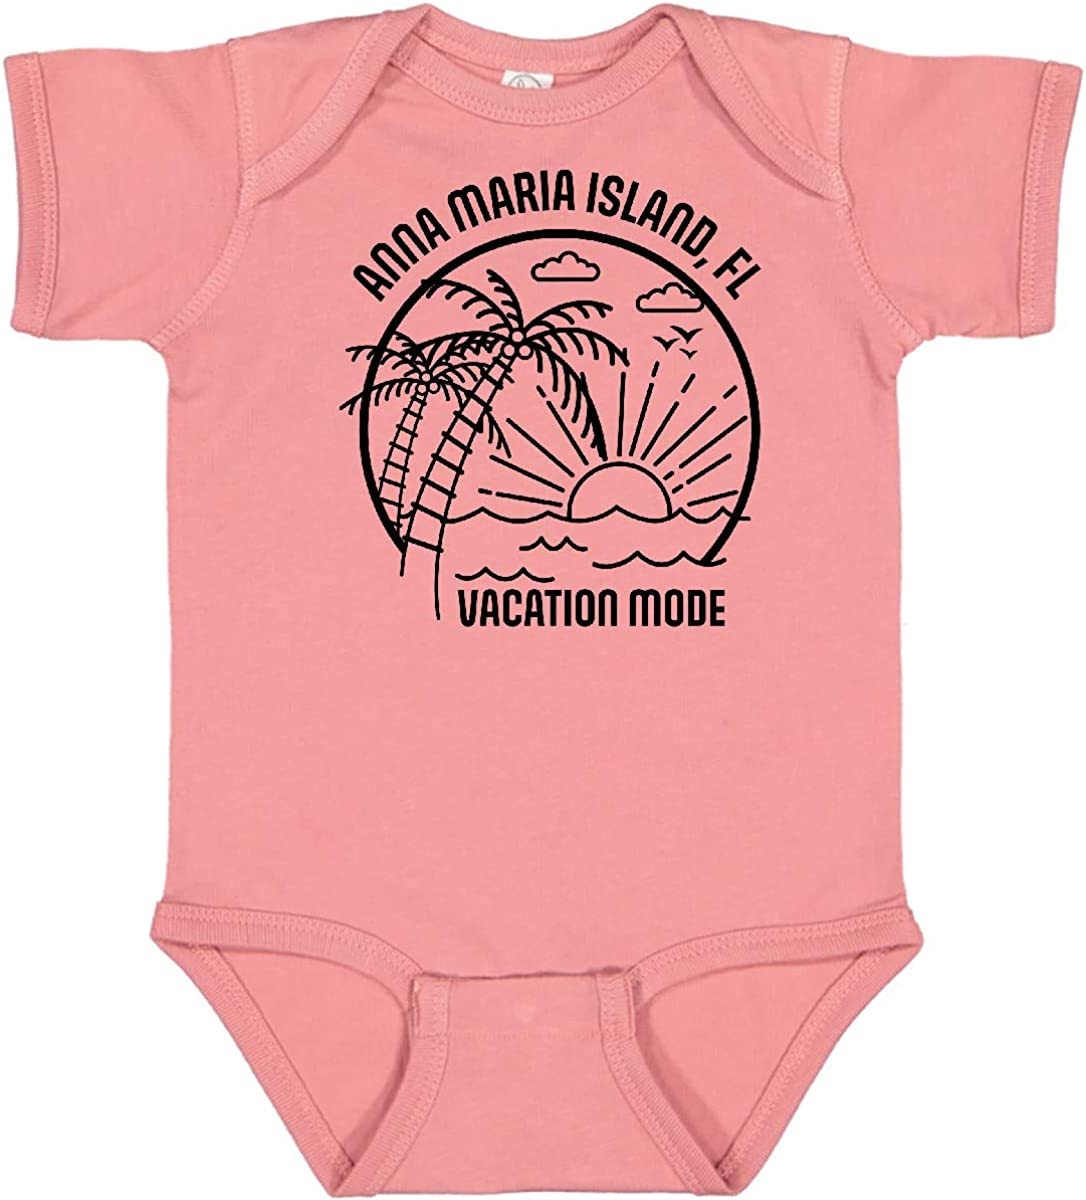 inktastic Summer Seasonal Wrap High quality Introduction Vacation Mode Anna Island Florida Maria Infant